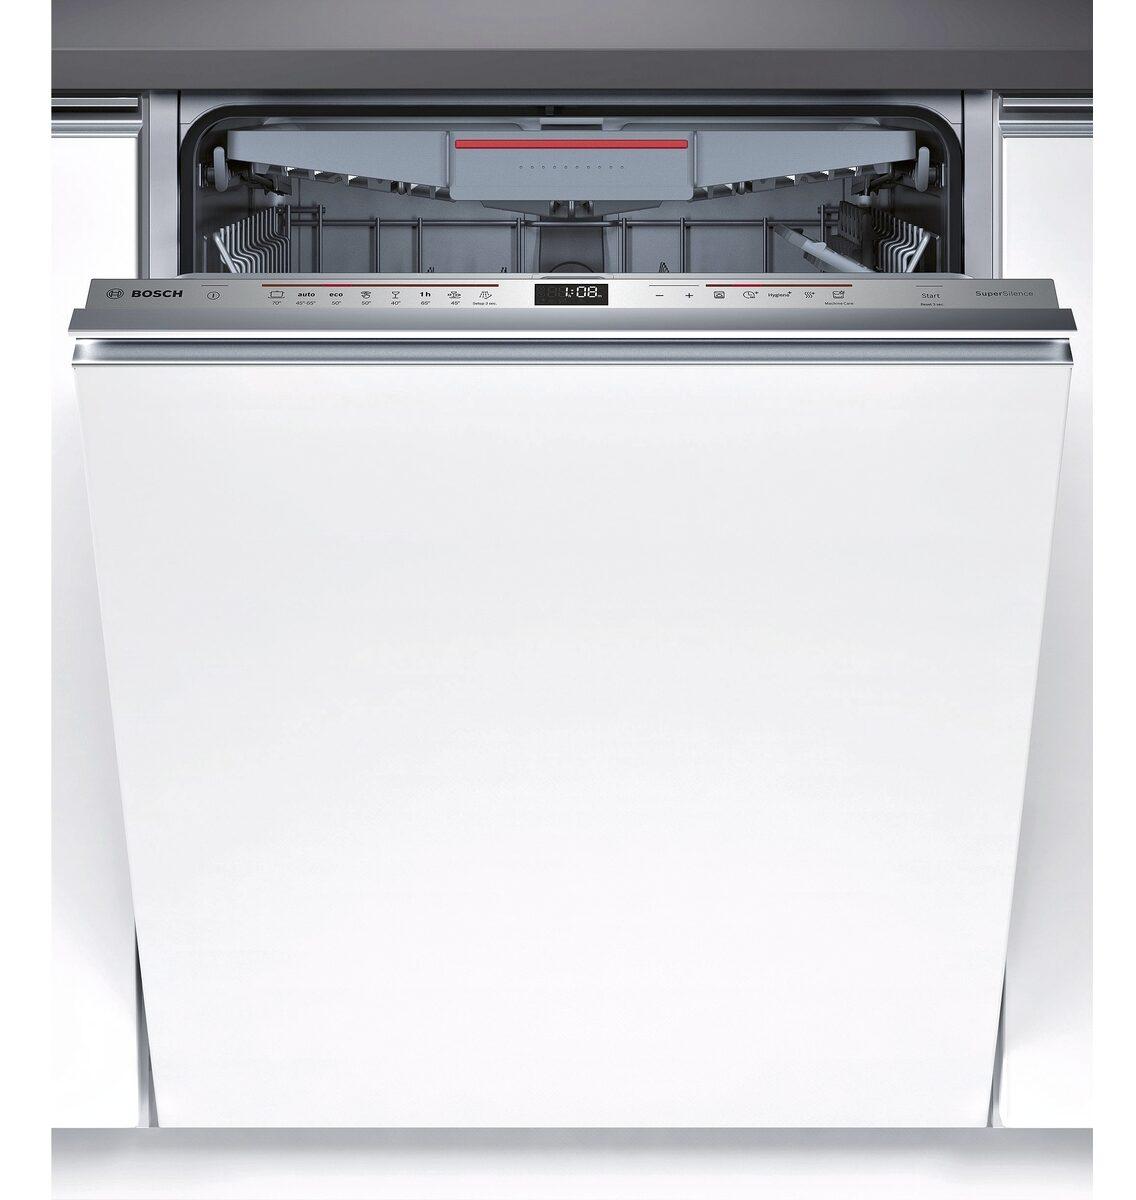 billig integreret opvaskemaskine